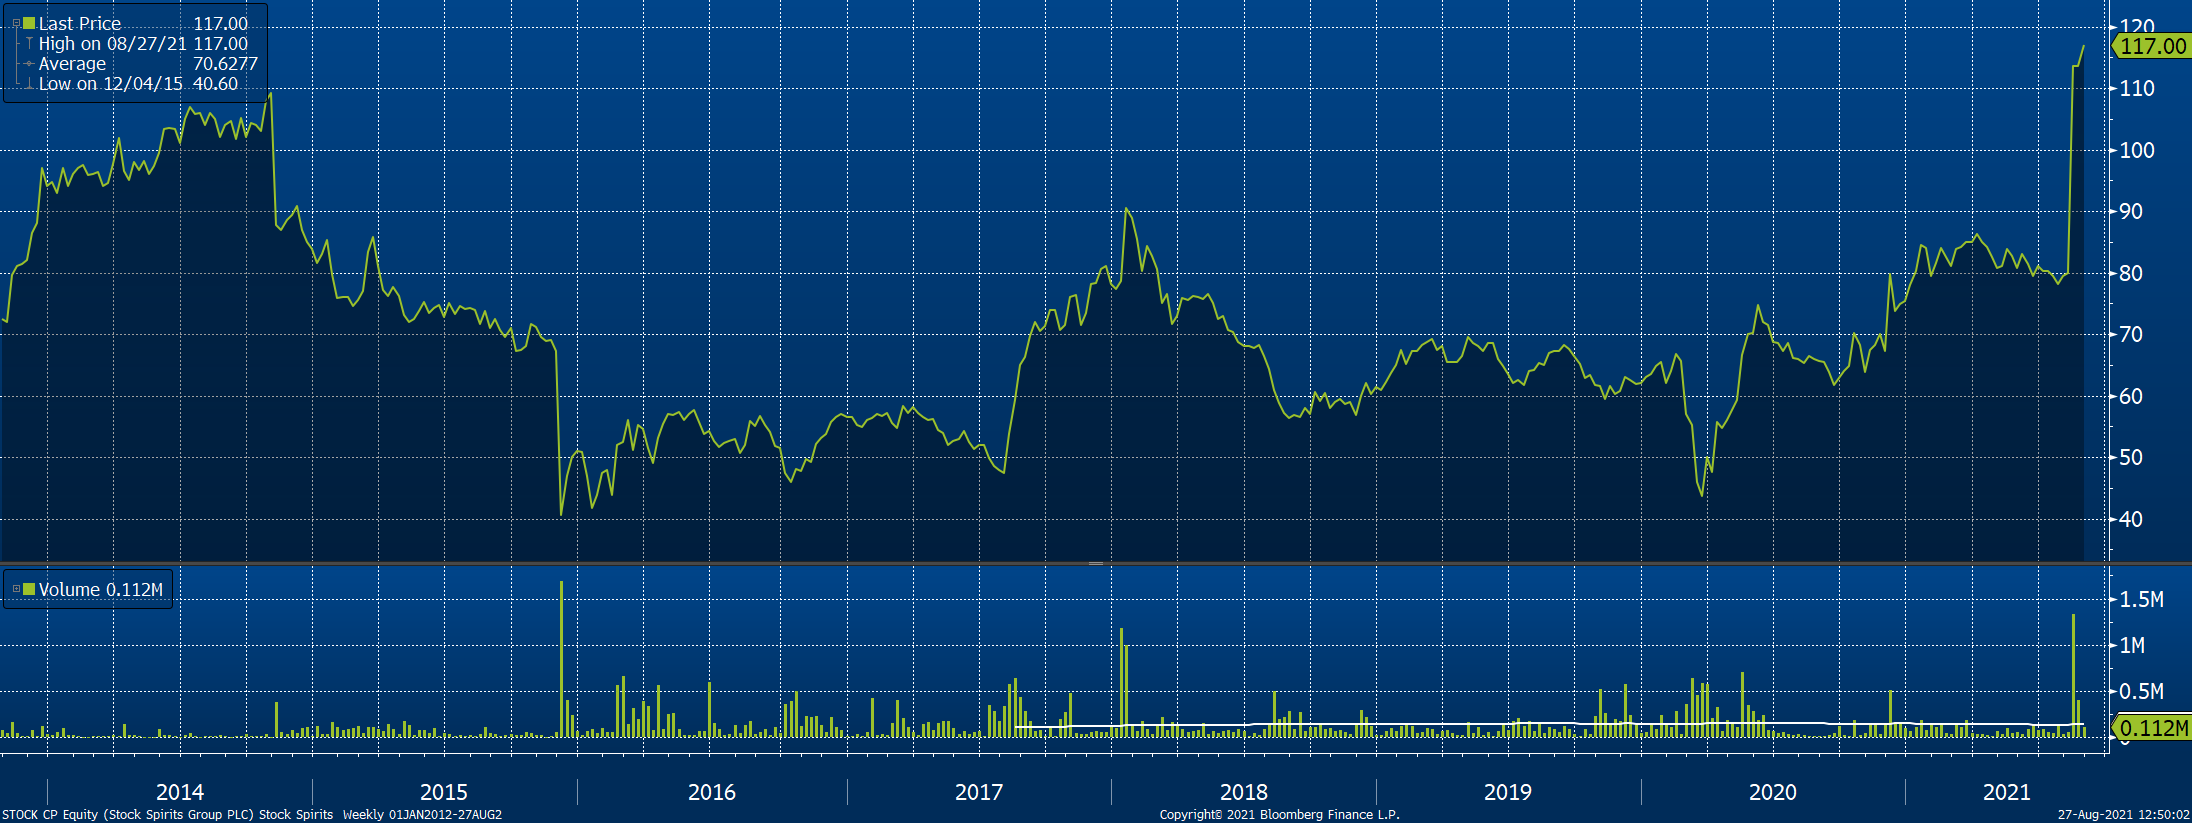 Vývoj akcií Stock Spirits Group (BAASTOCK) na pražské burze od IPO v říjnu 2013